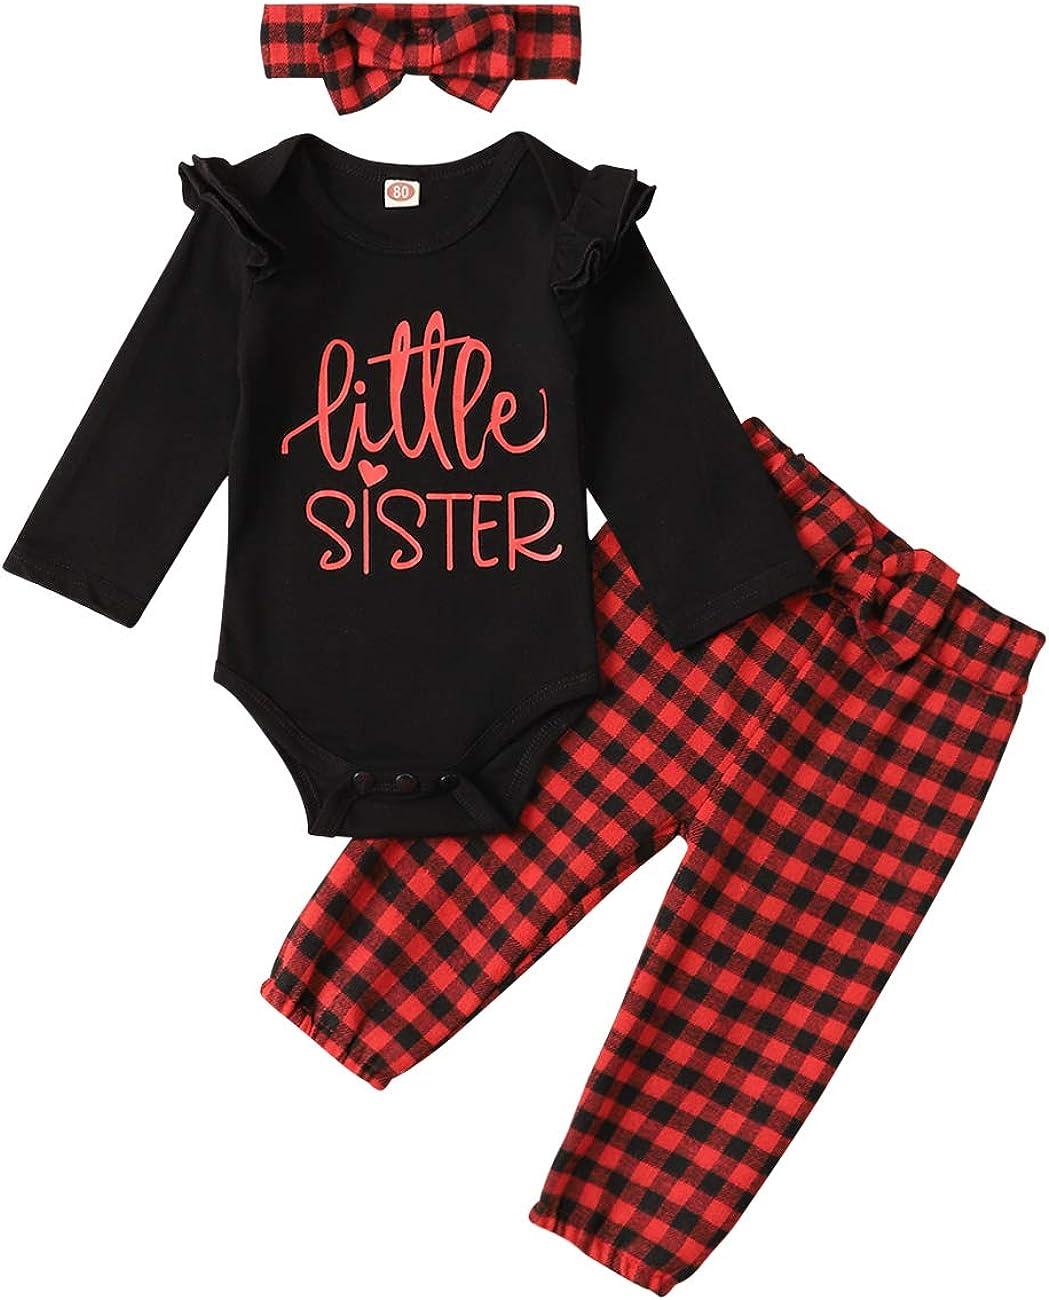 Newborn Little Sister Big Sister Matching Outfits Baby Girls Romper Shirt Tops Floral Skirt Dress Pants Clothes Set